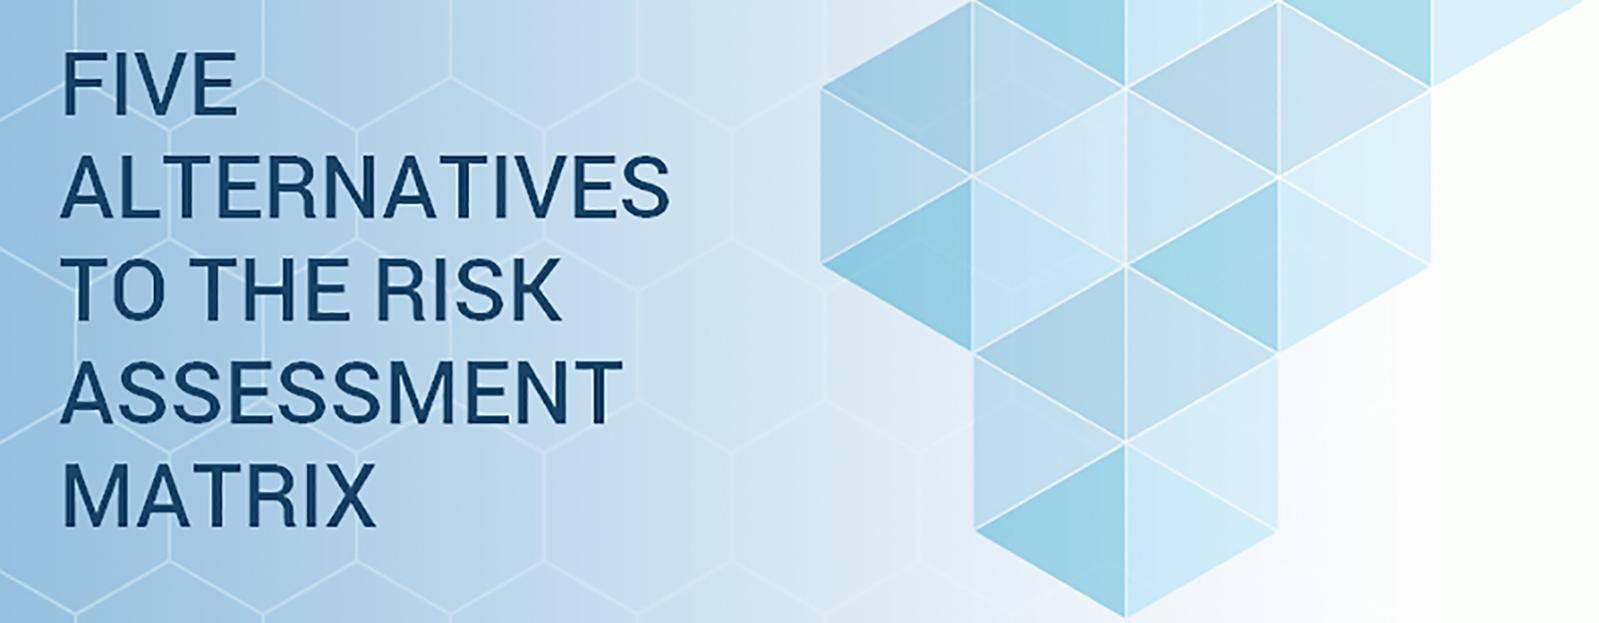 5 Alternatives To The Risk Assessment Matrix